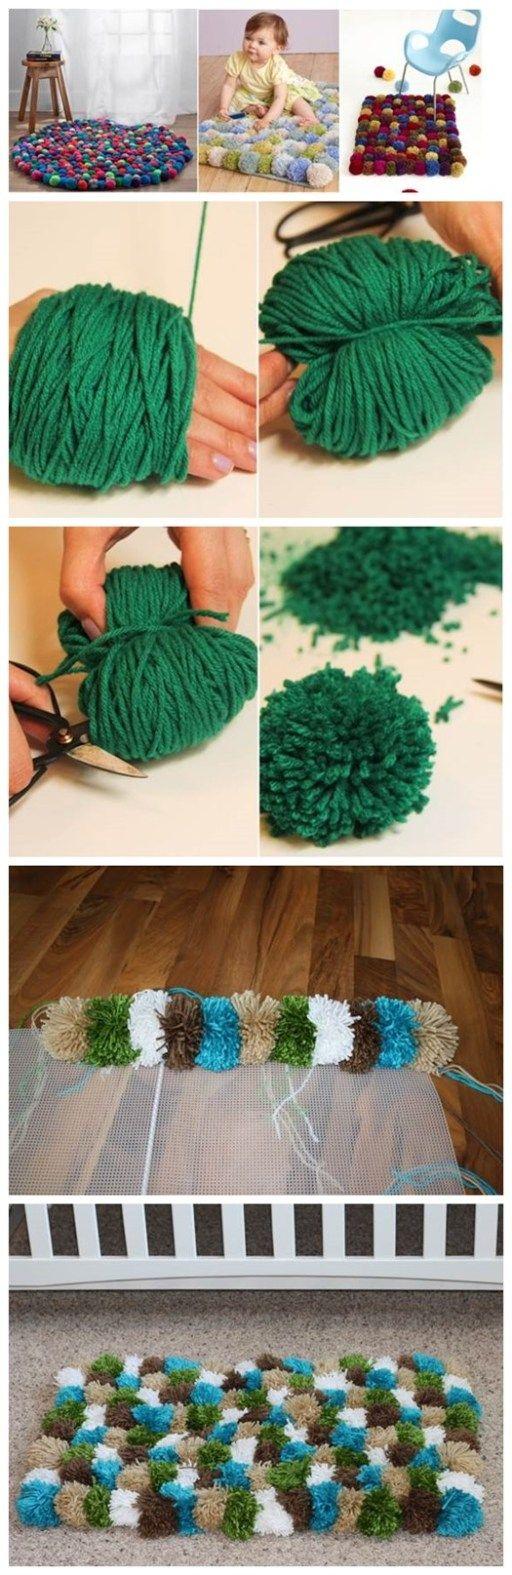 How To Make Diy Pom Pom Rugs Tutorial Diy Tag Diytag